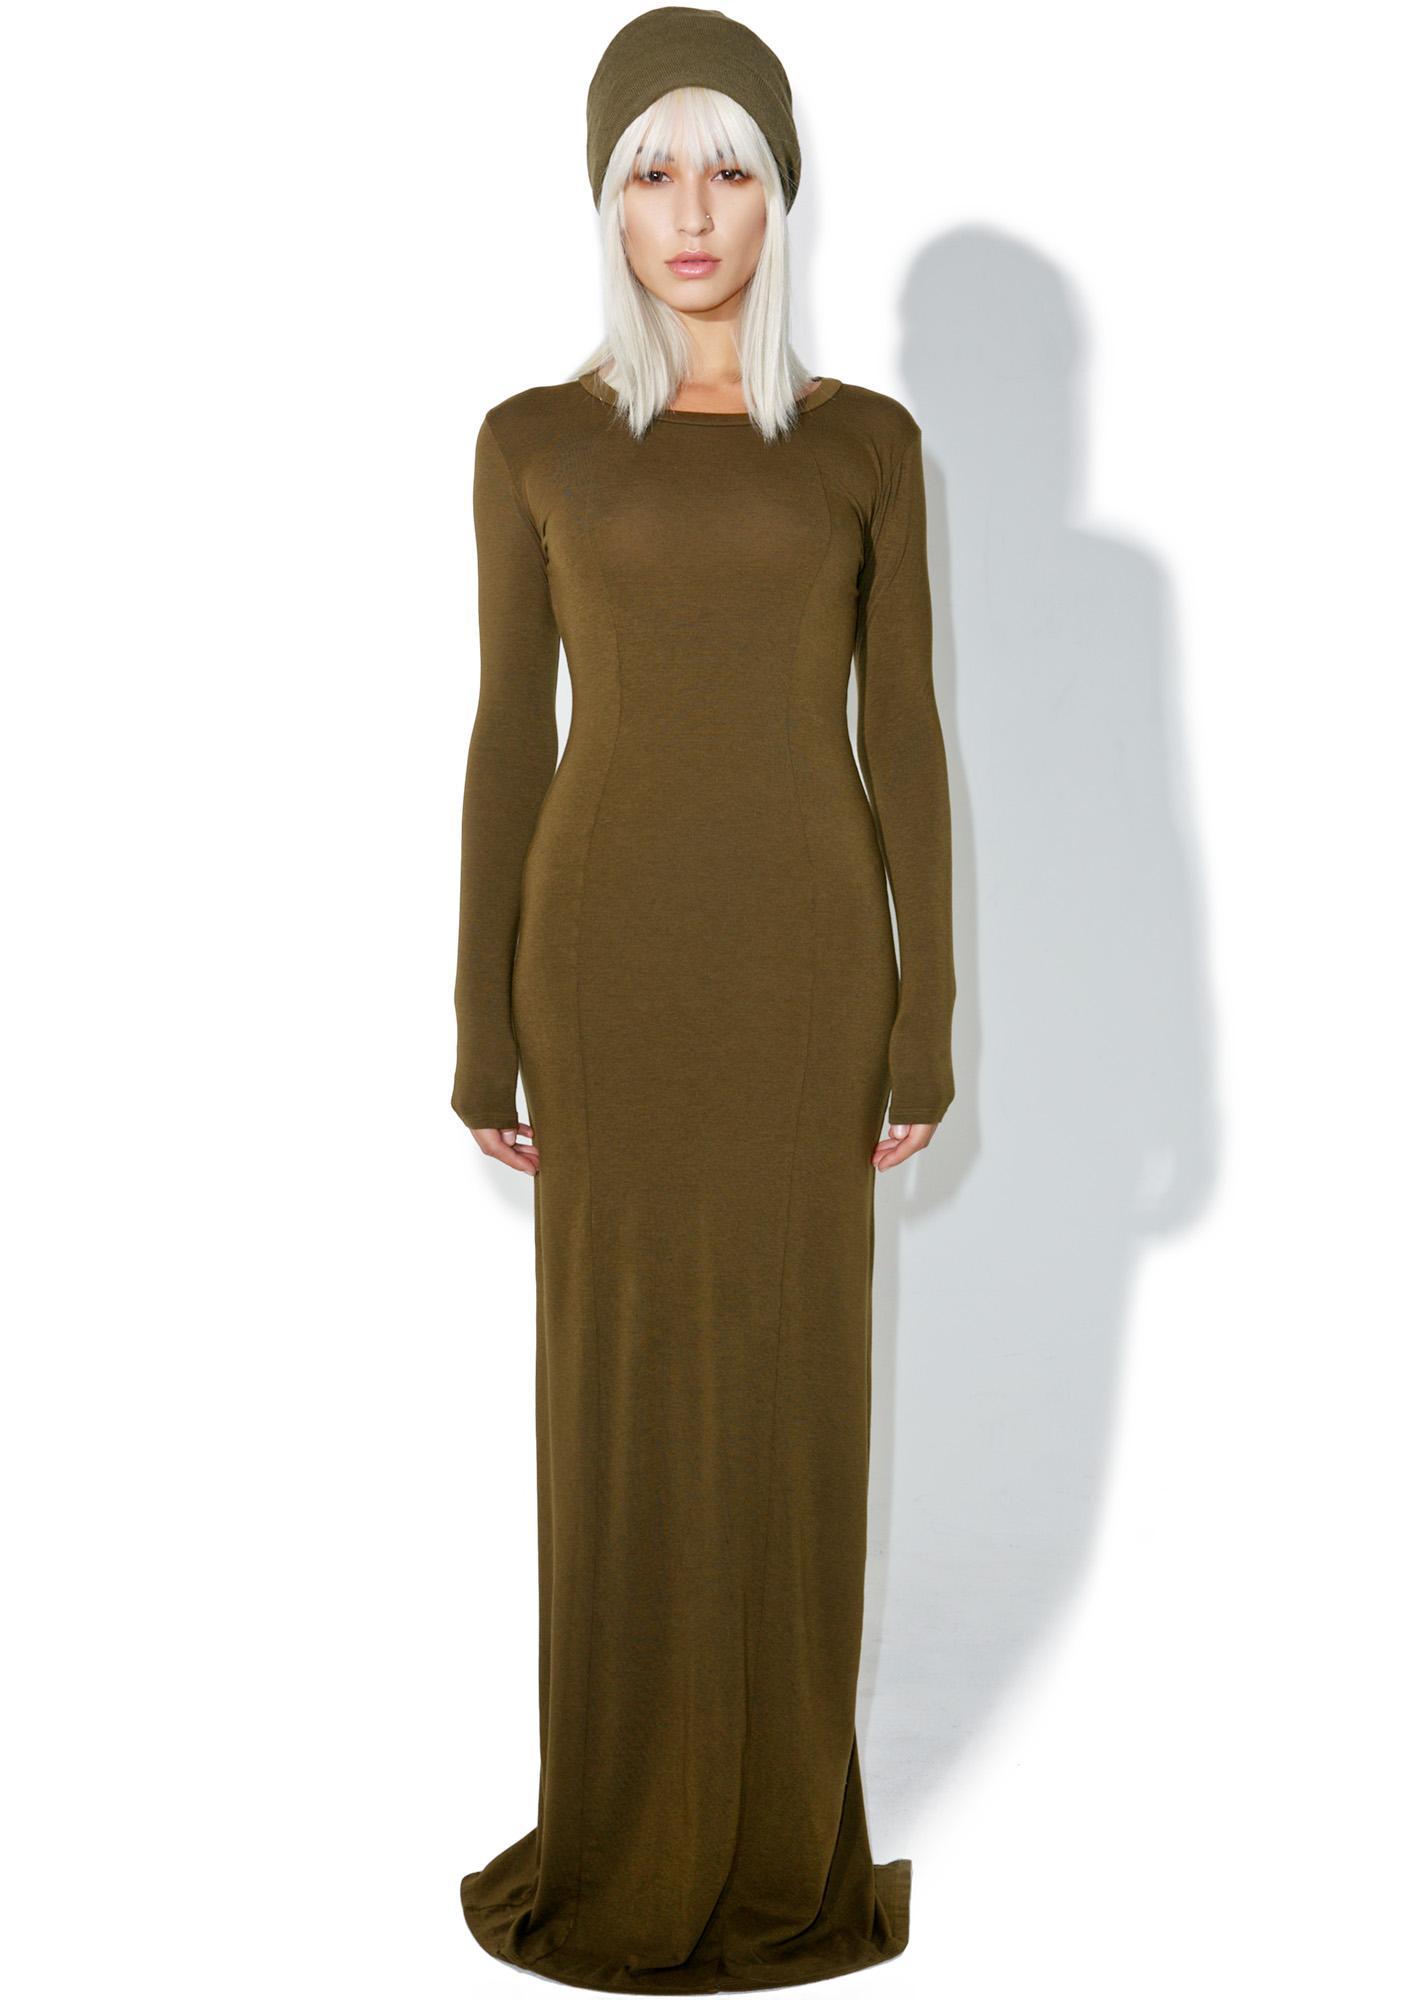 Groceries Apparel Anberlin Dress